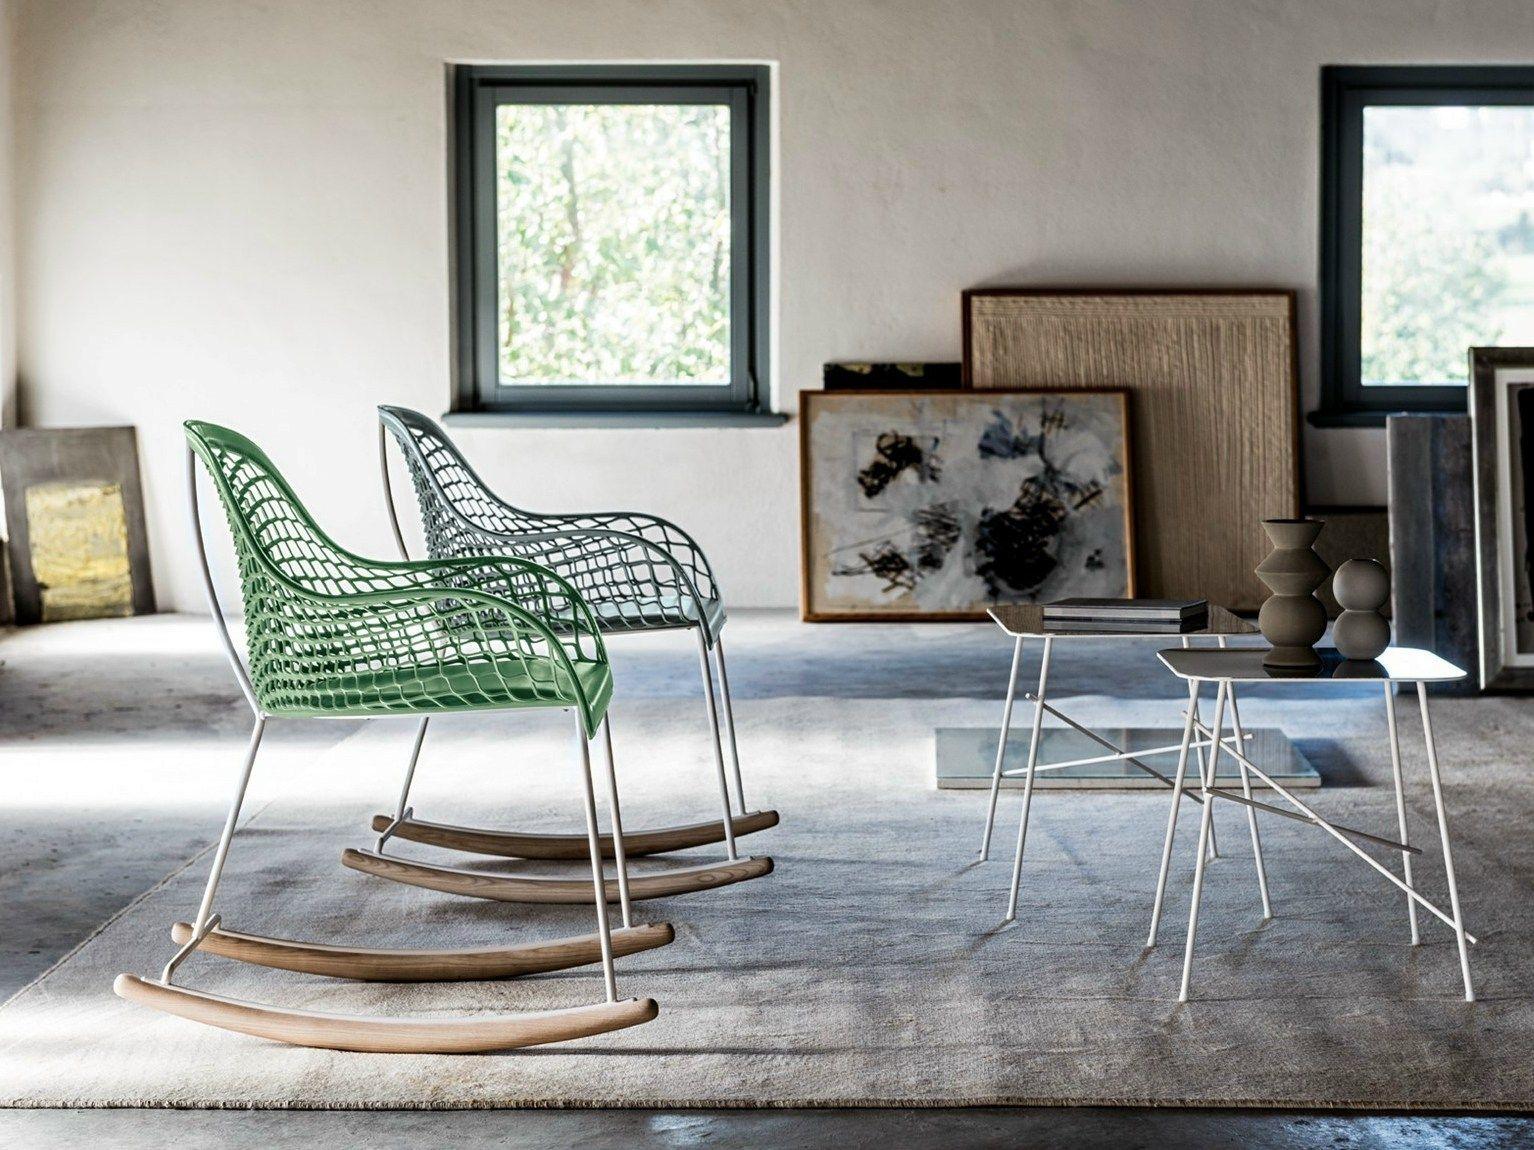 Guapa, Rocking Chairs by Midj